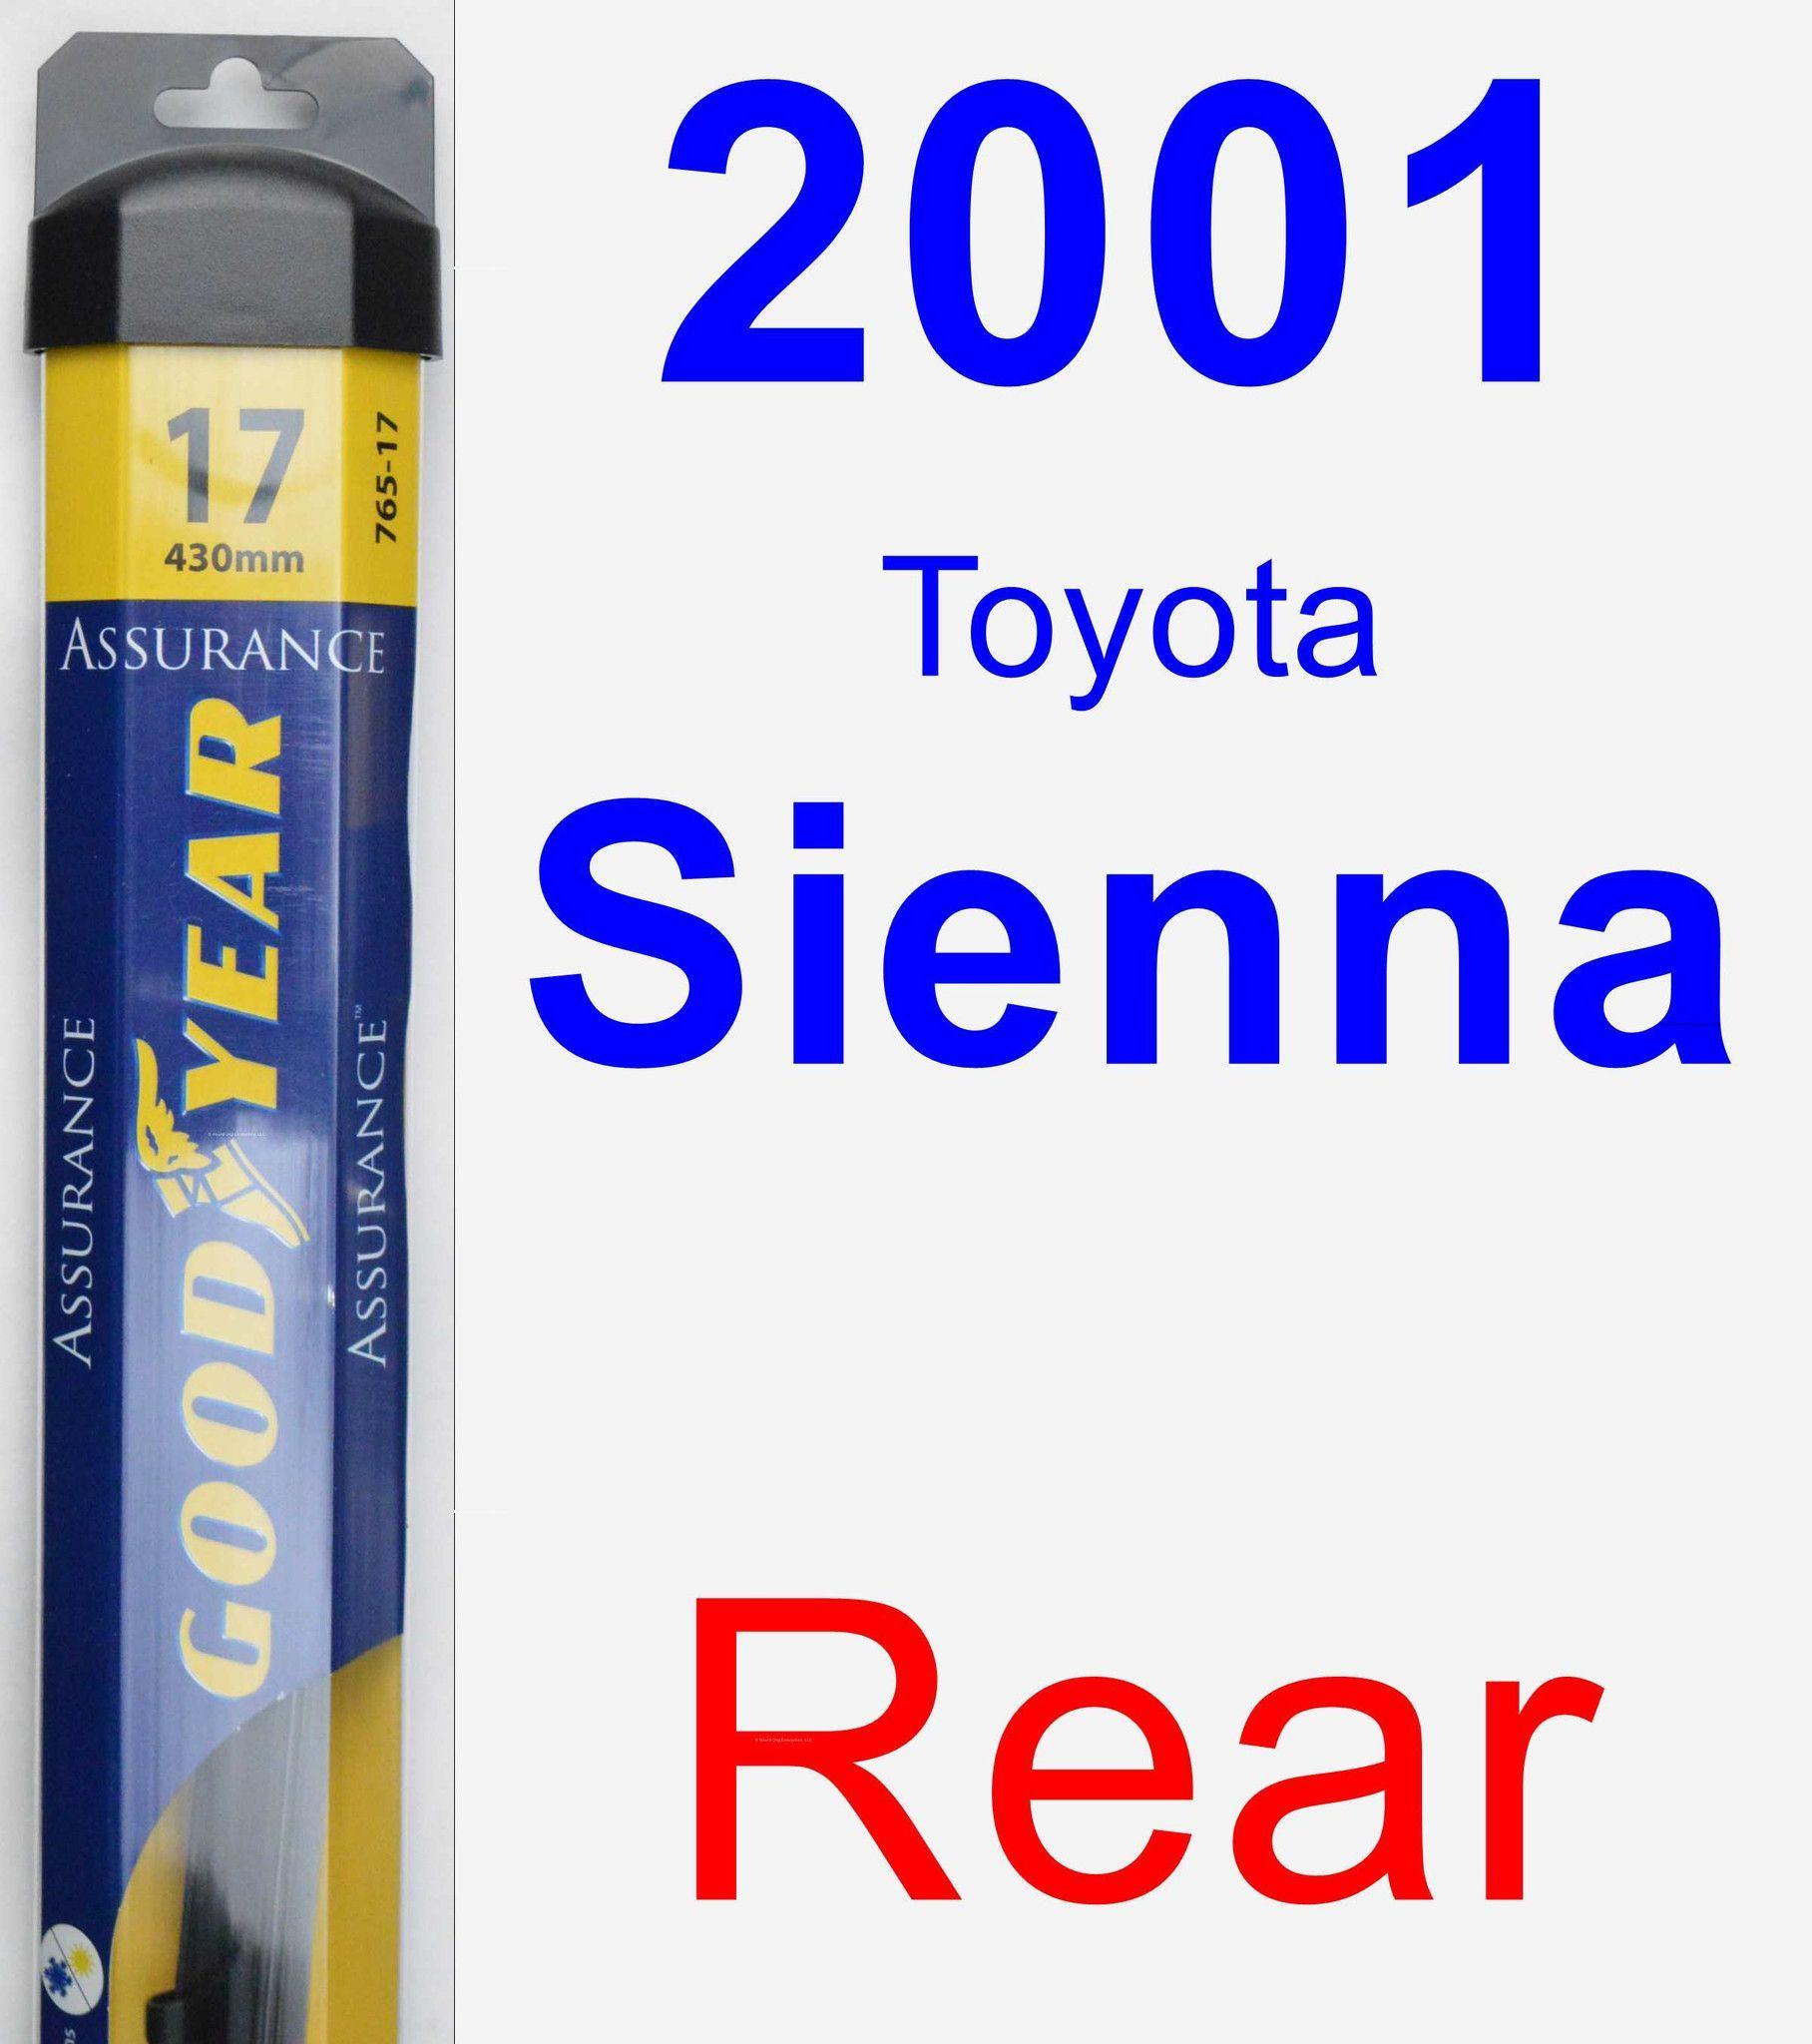 Rear wiper blade for 2001 toyota sienna assurance